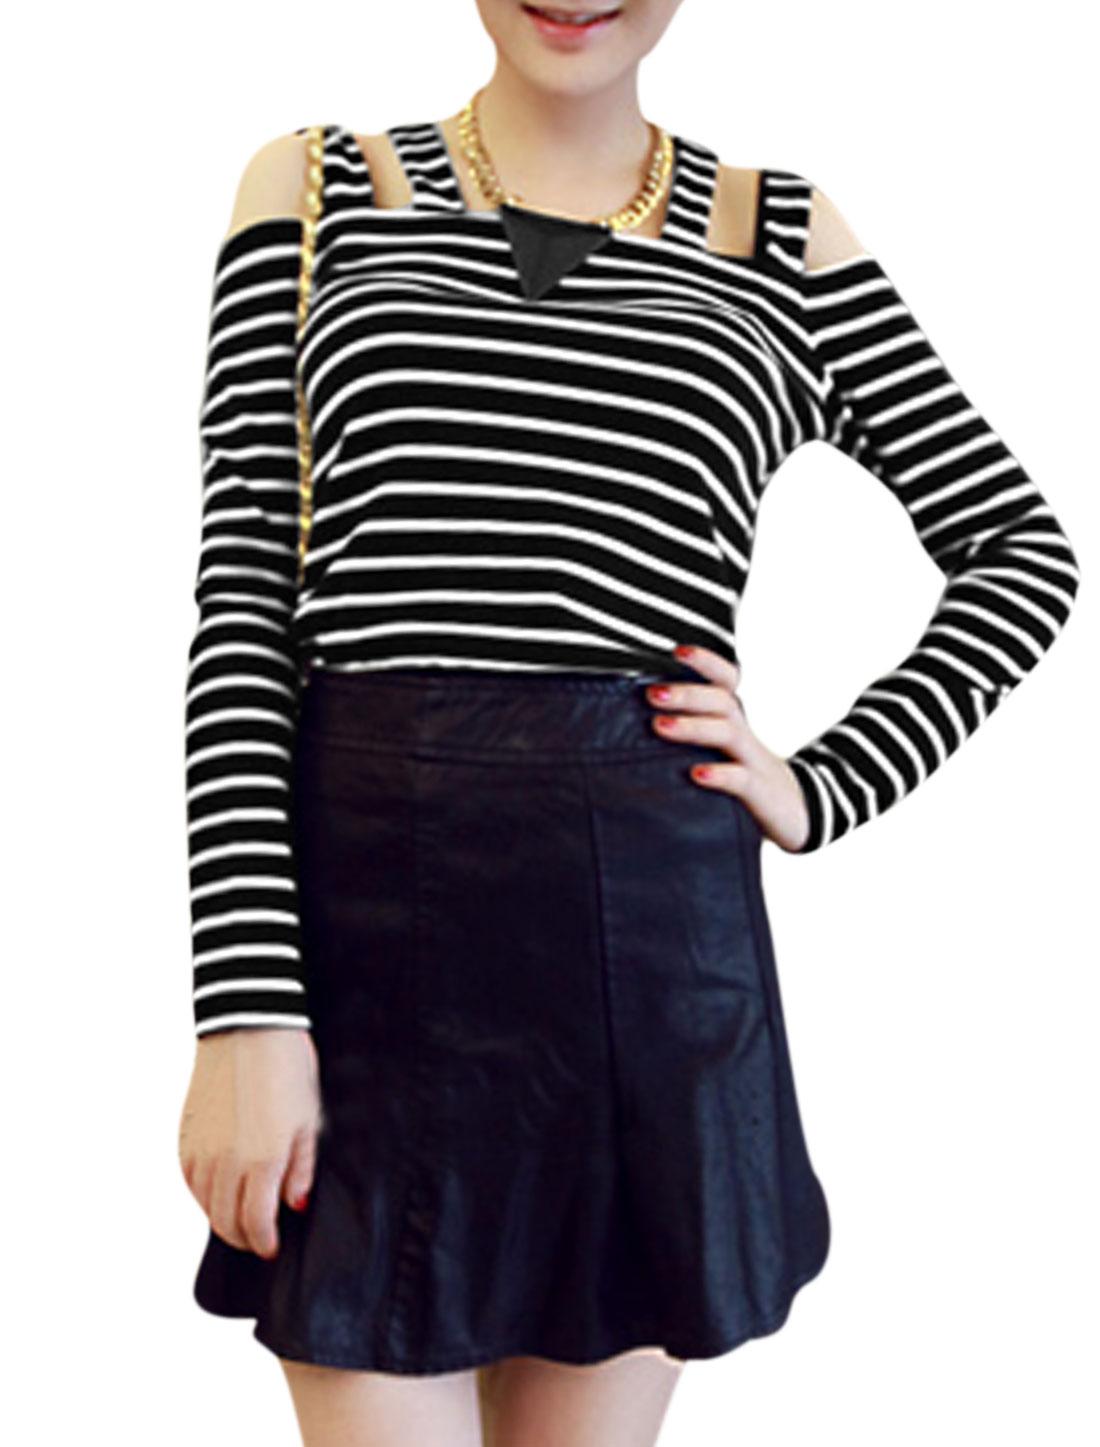 Ladies Multi Straps Bar Striped Pullover Sexy Top Black White S